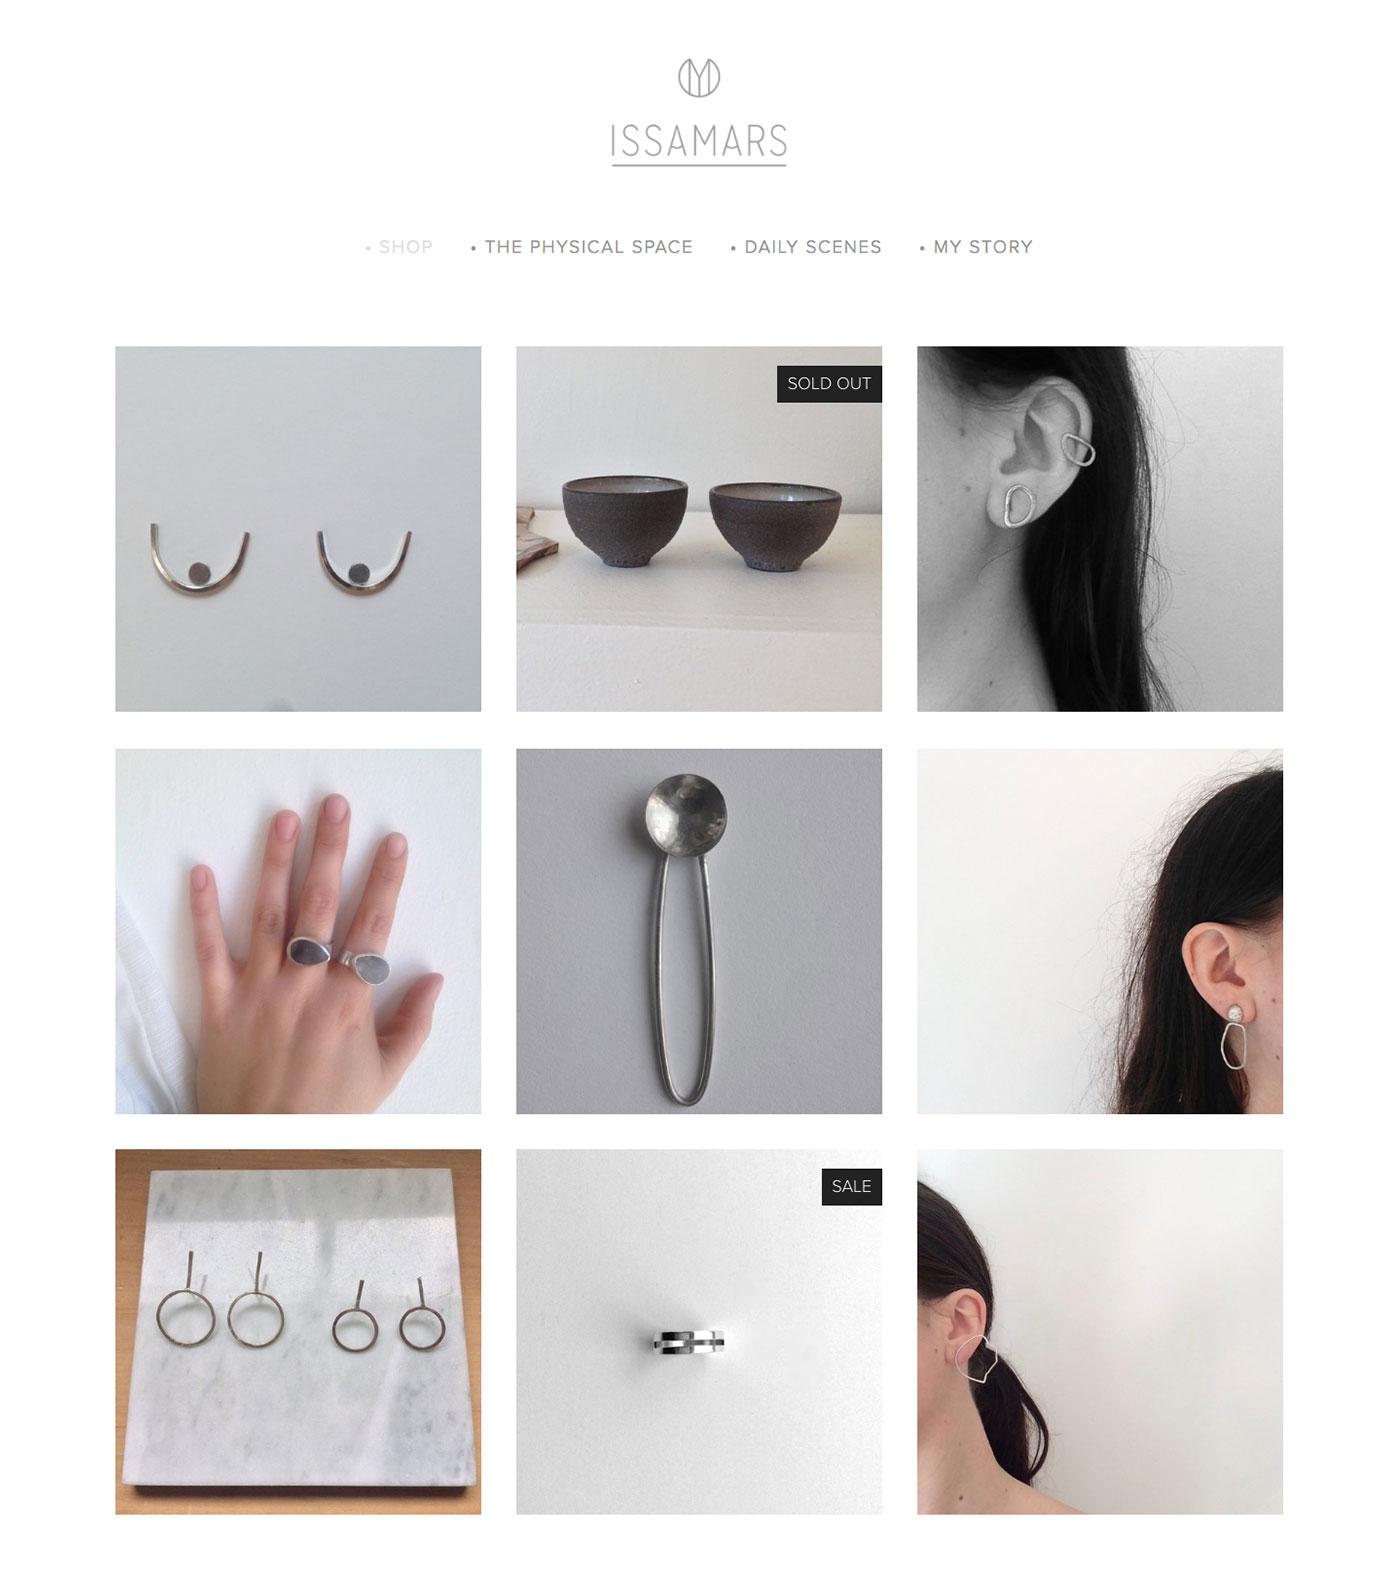 Issa Mars Jewelry on Squarespace